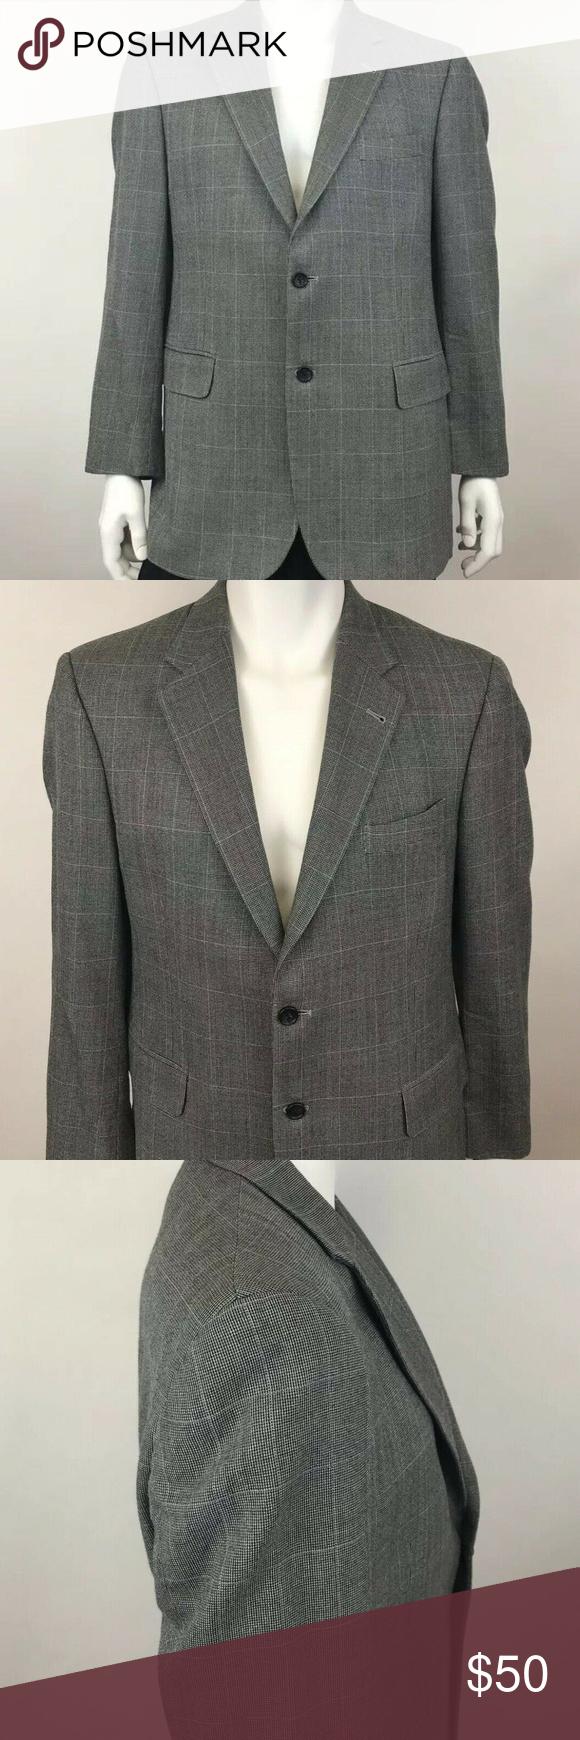 Jos A Bank Men's Silk Wool Sport Blazer Size 41R Jos A